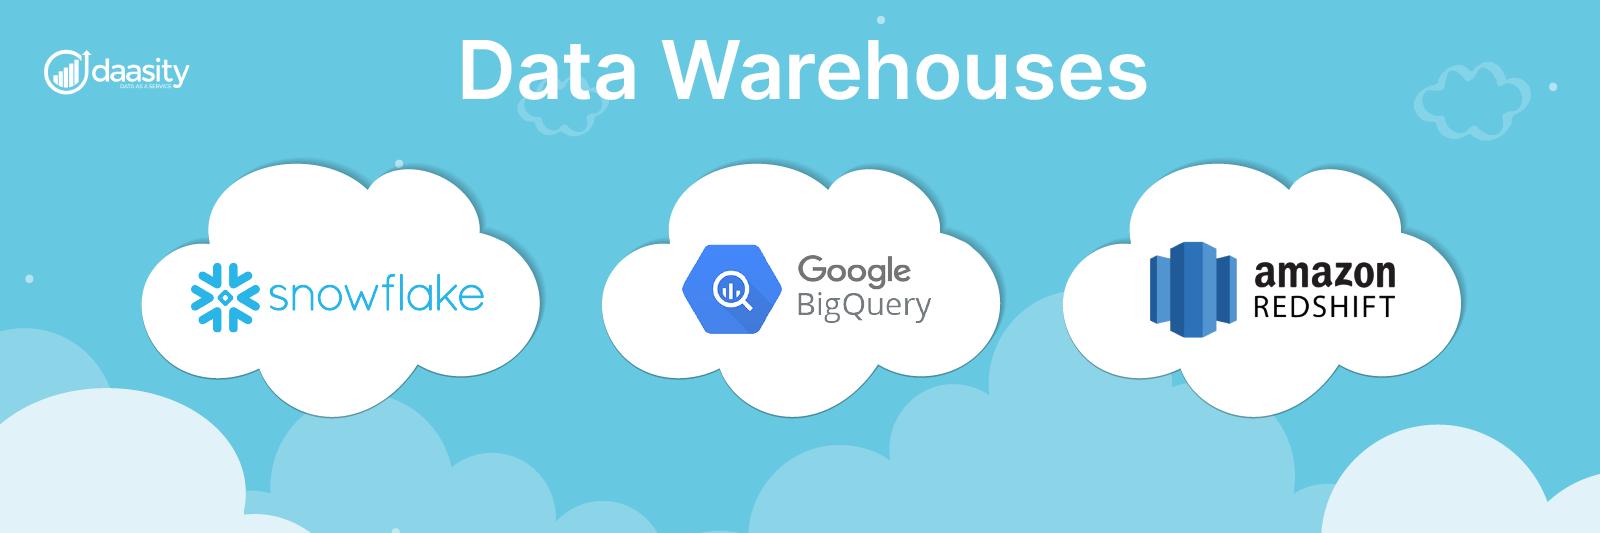 Data Warehouses (Snowflake, BigQuery, Redshift)